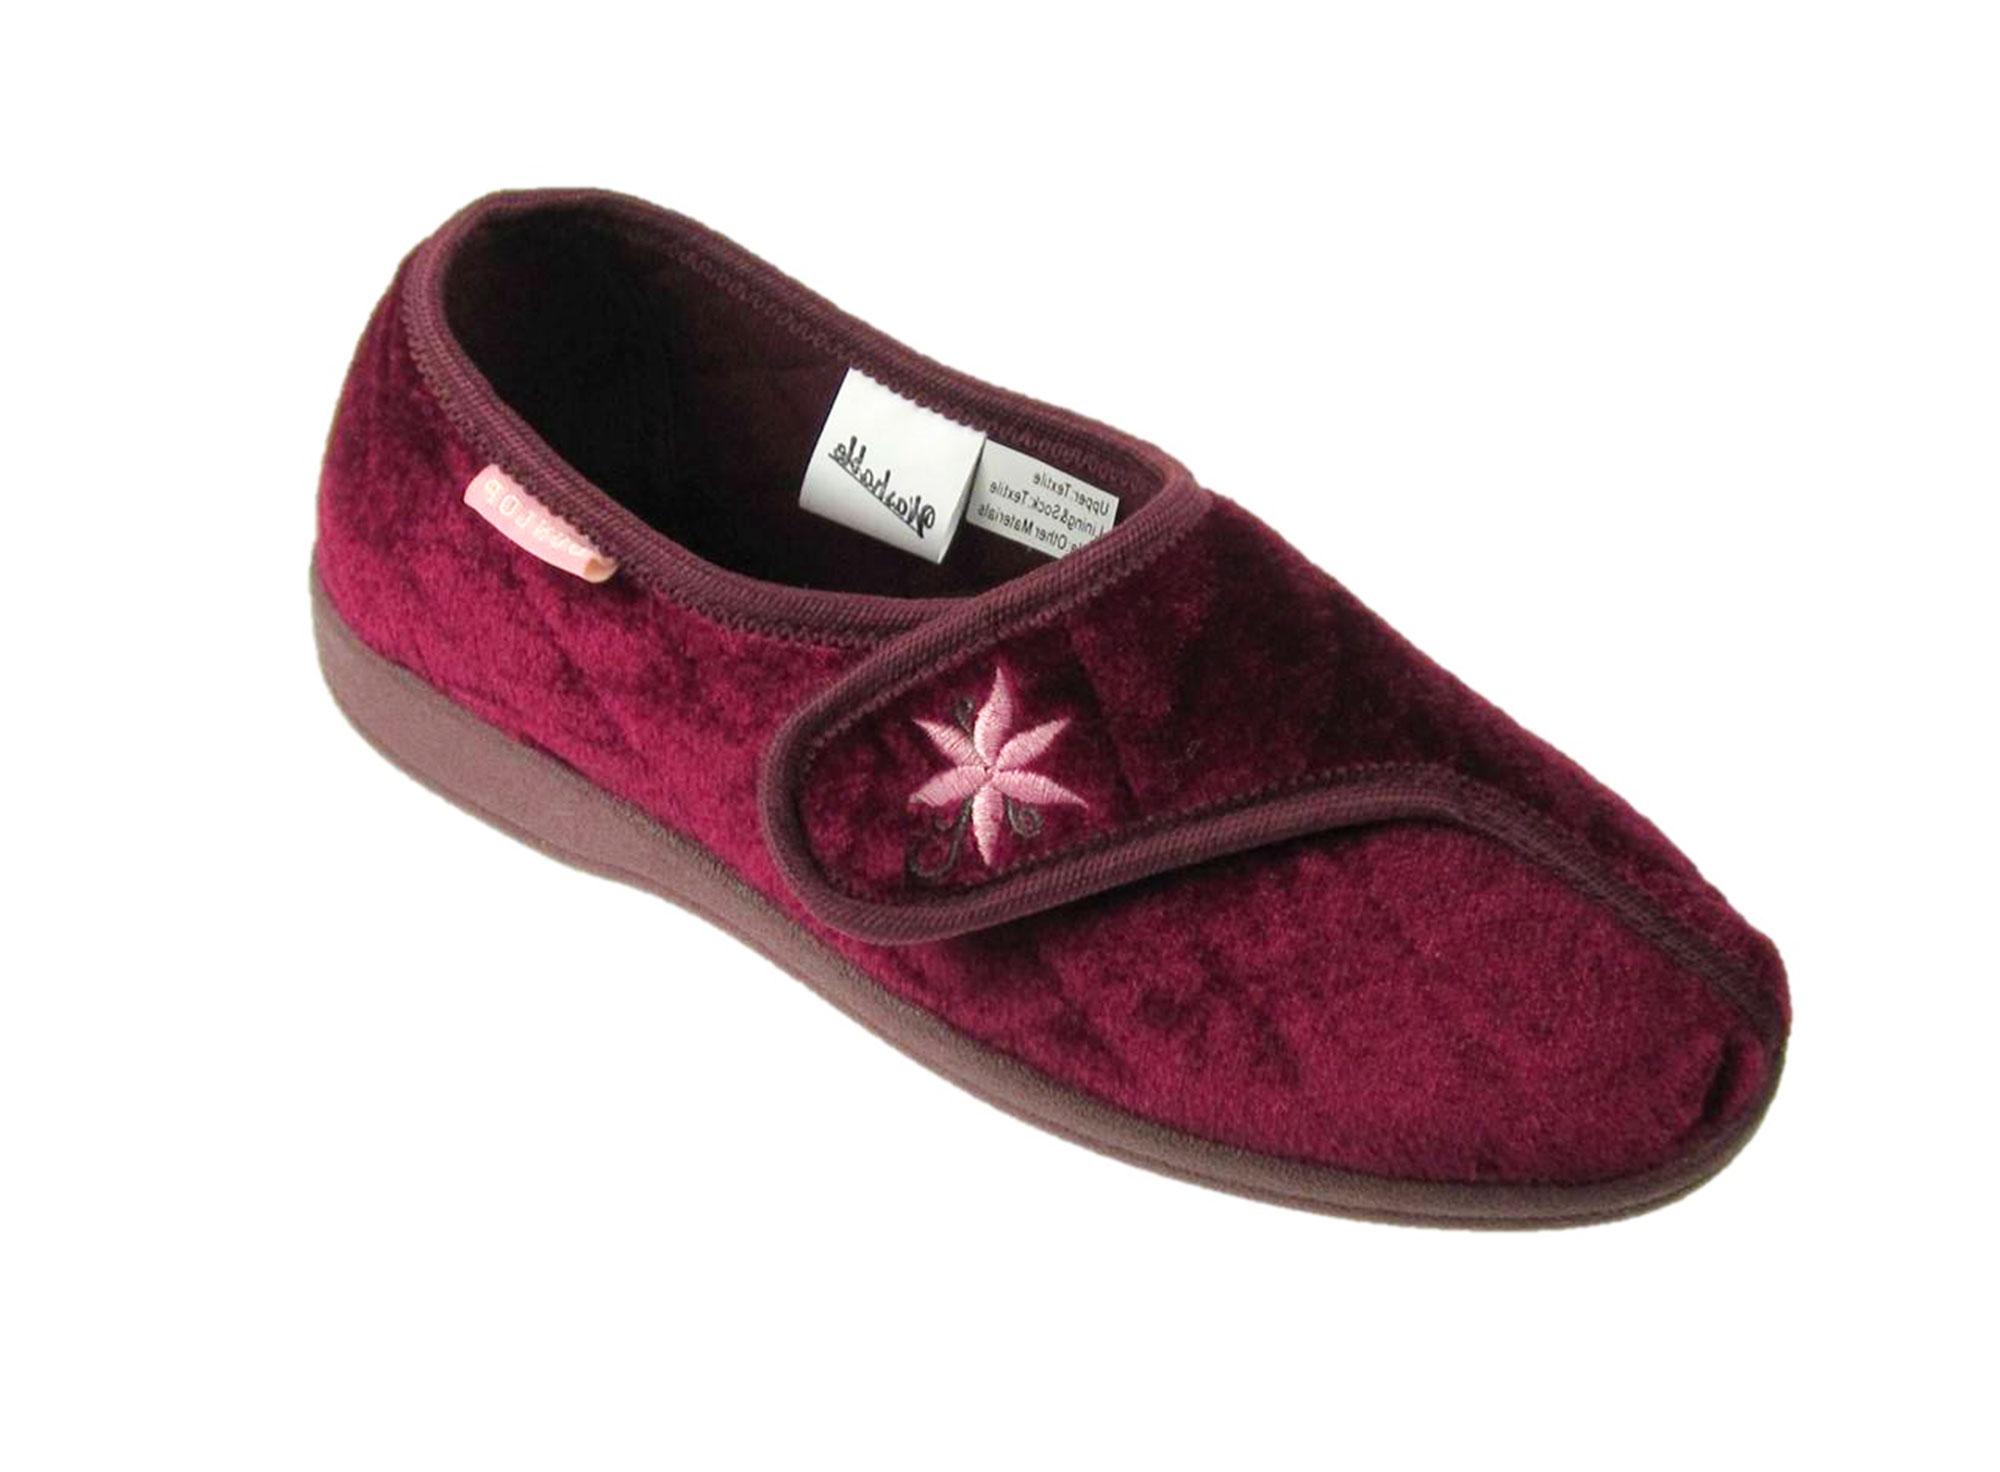 Wide Fit Velcro Shoes